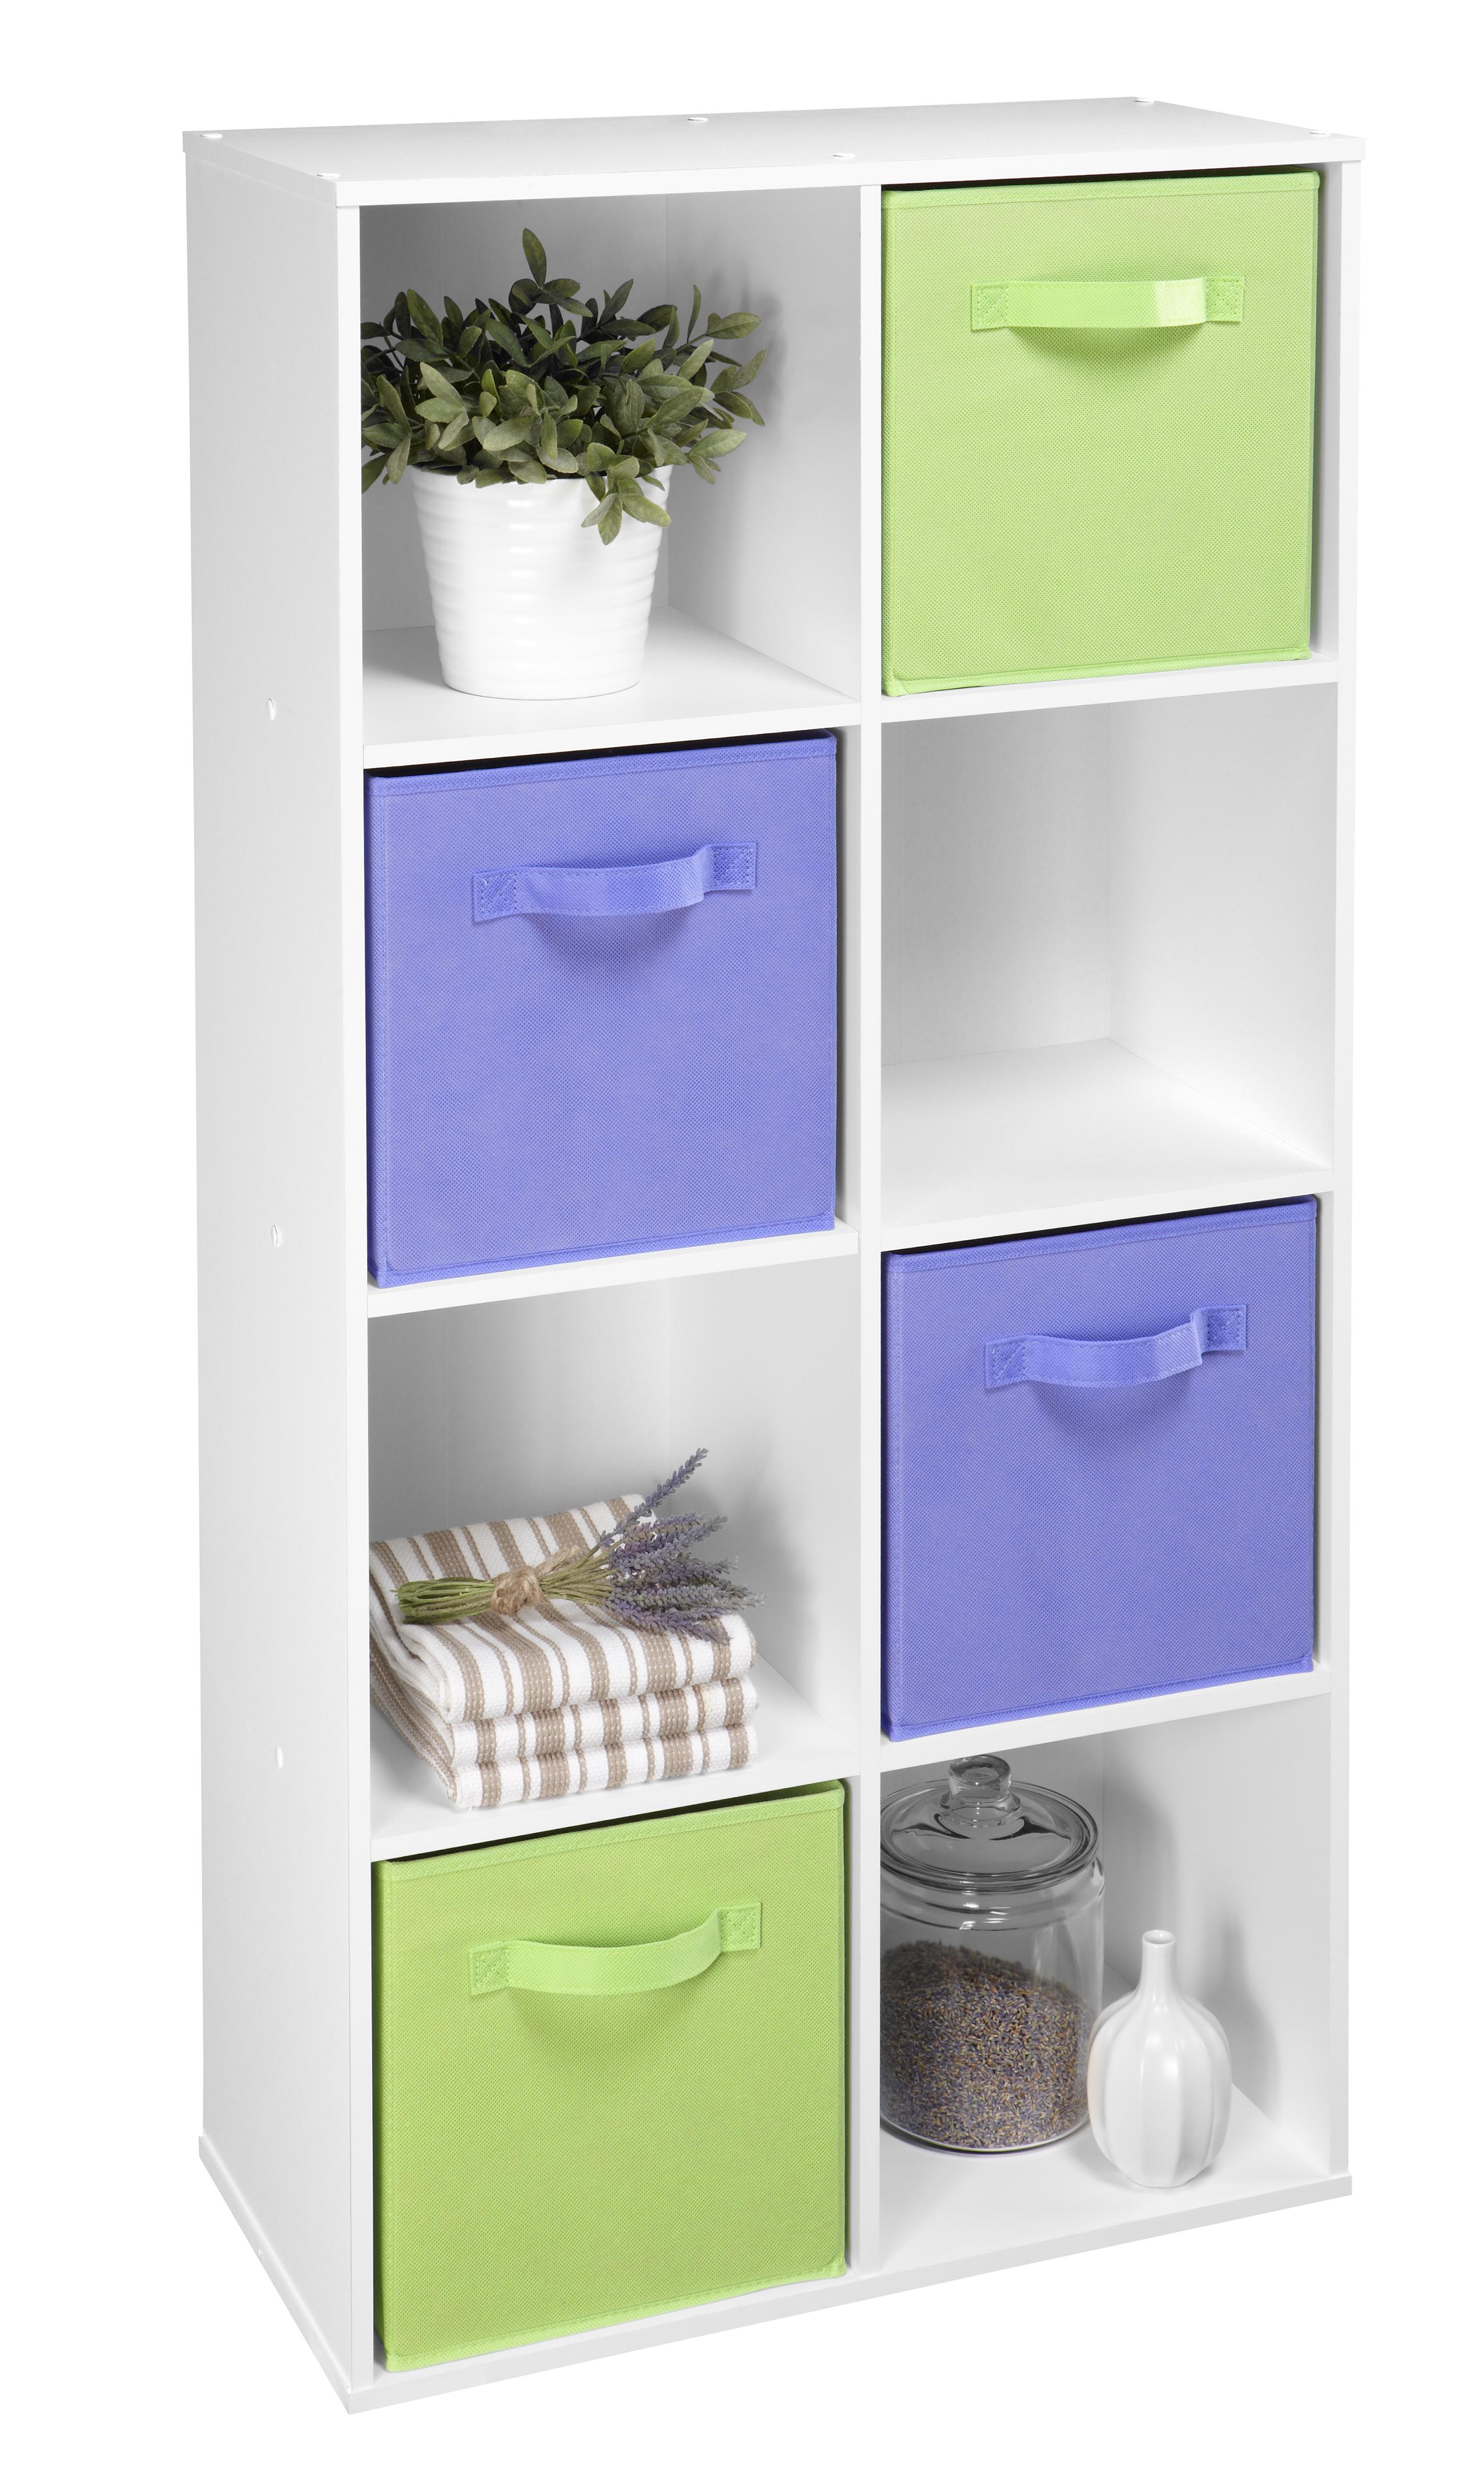 Incroyable ClosetMaid Cubeicals 8 Cube Organizer